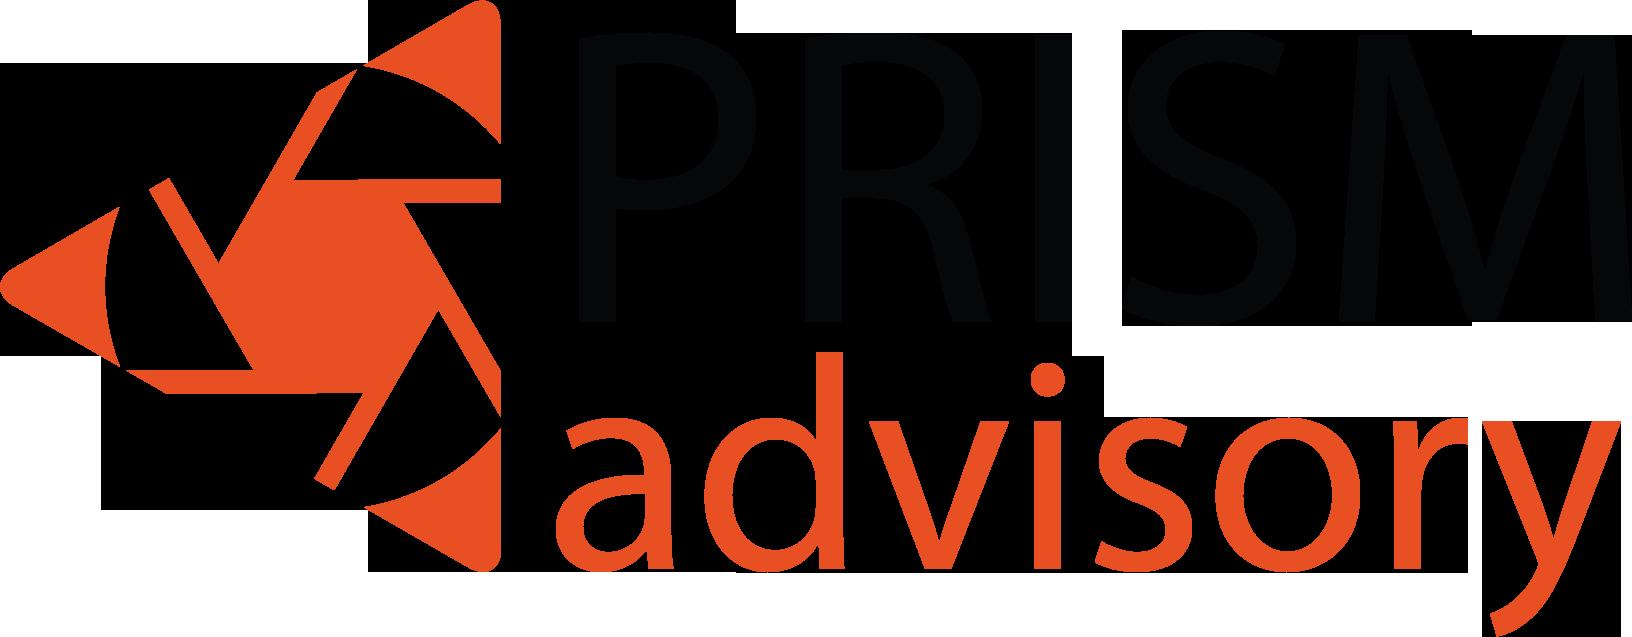 PRISM Advisory LLC